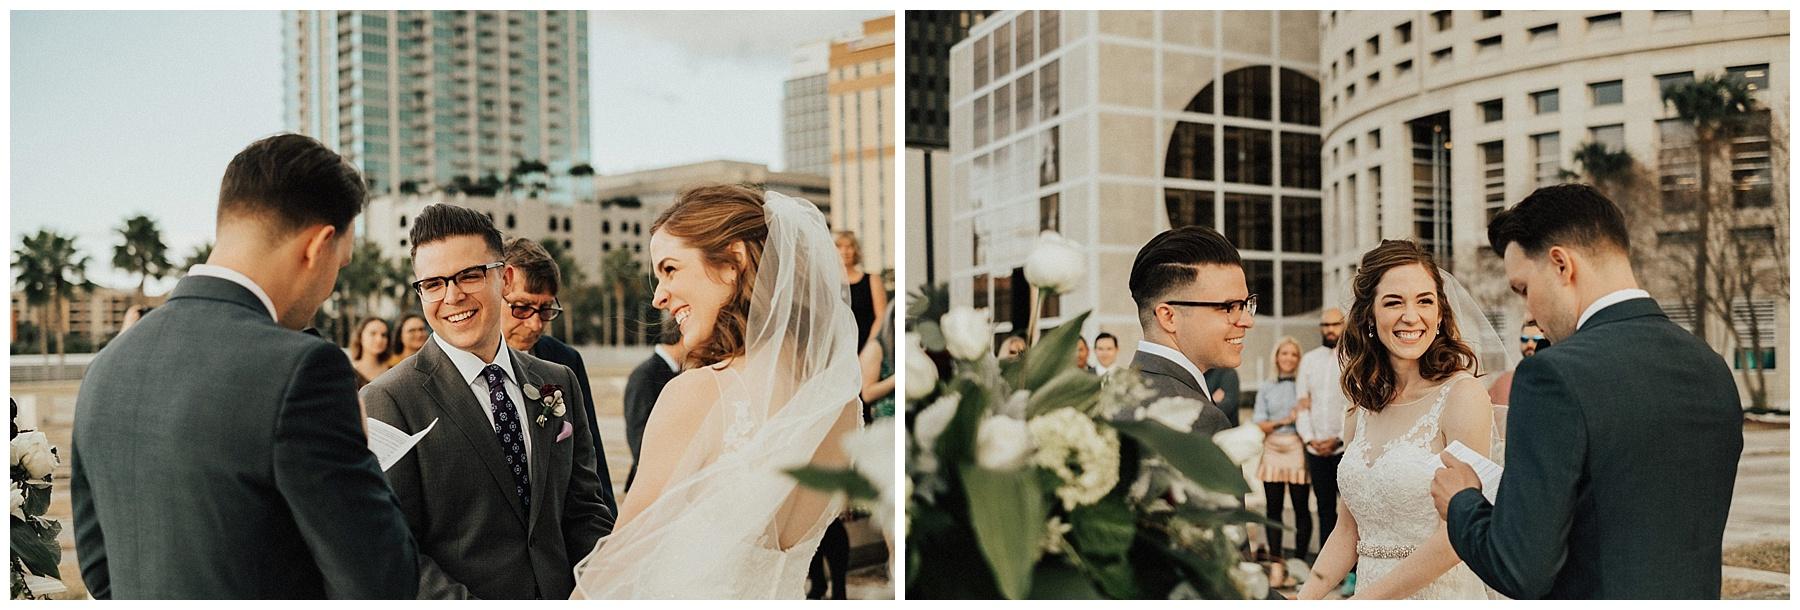 Kylie Garden Wedding Tampa Wedding Photographer-77.jpg